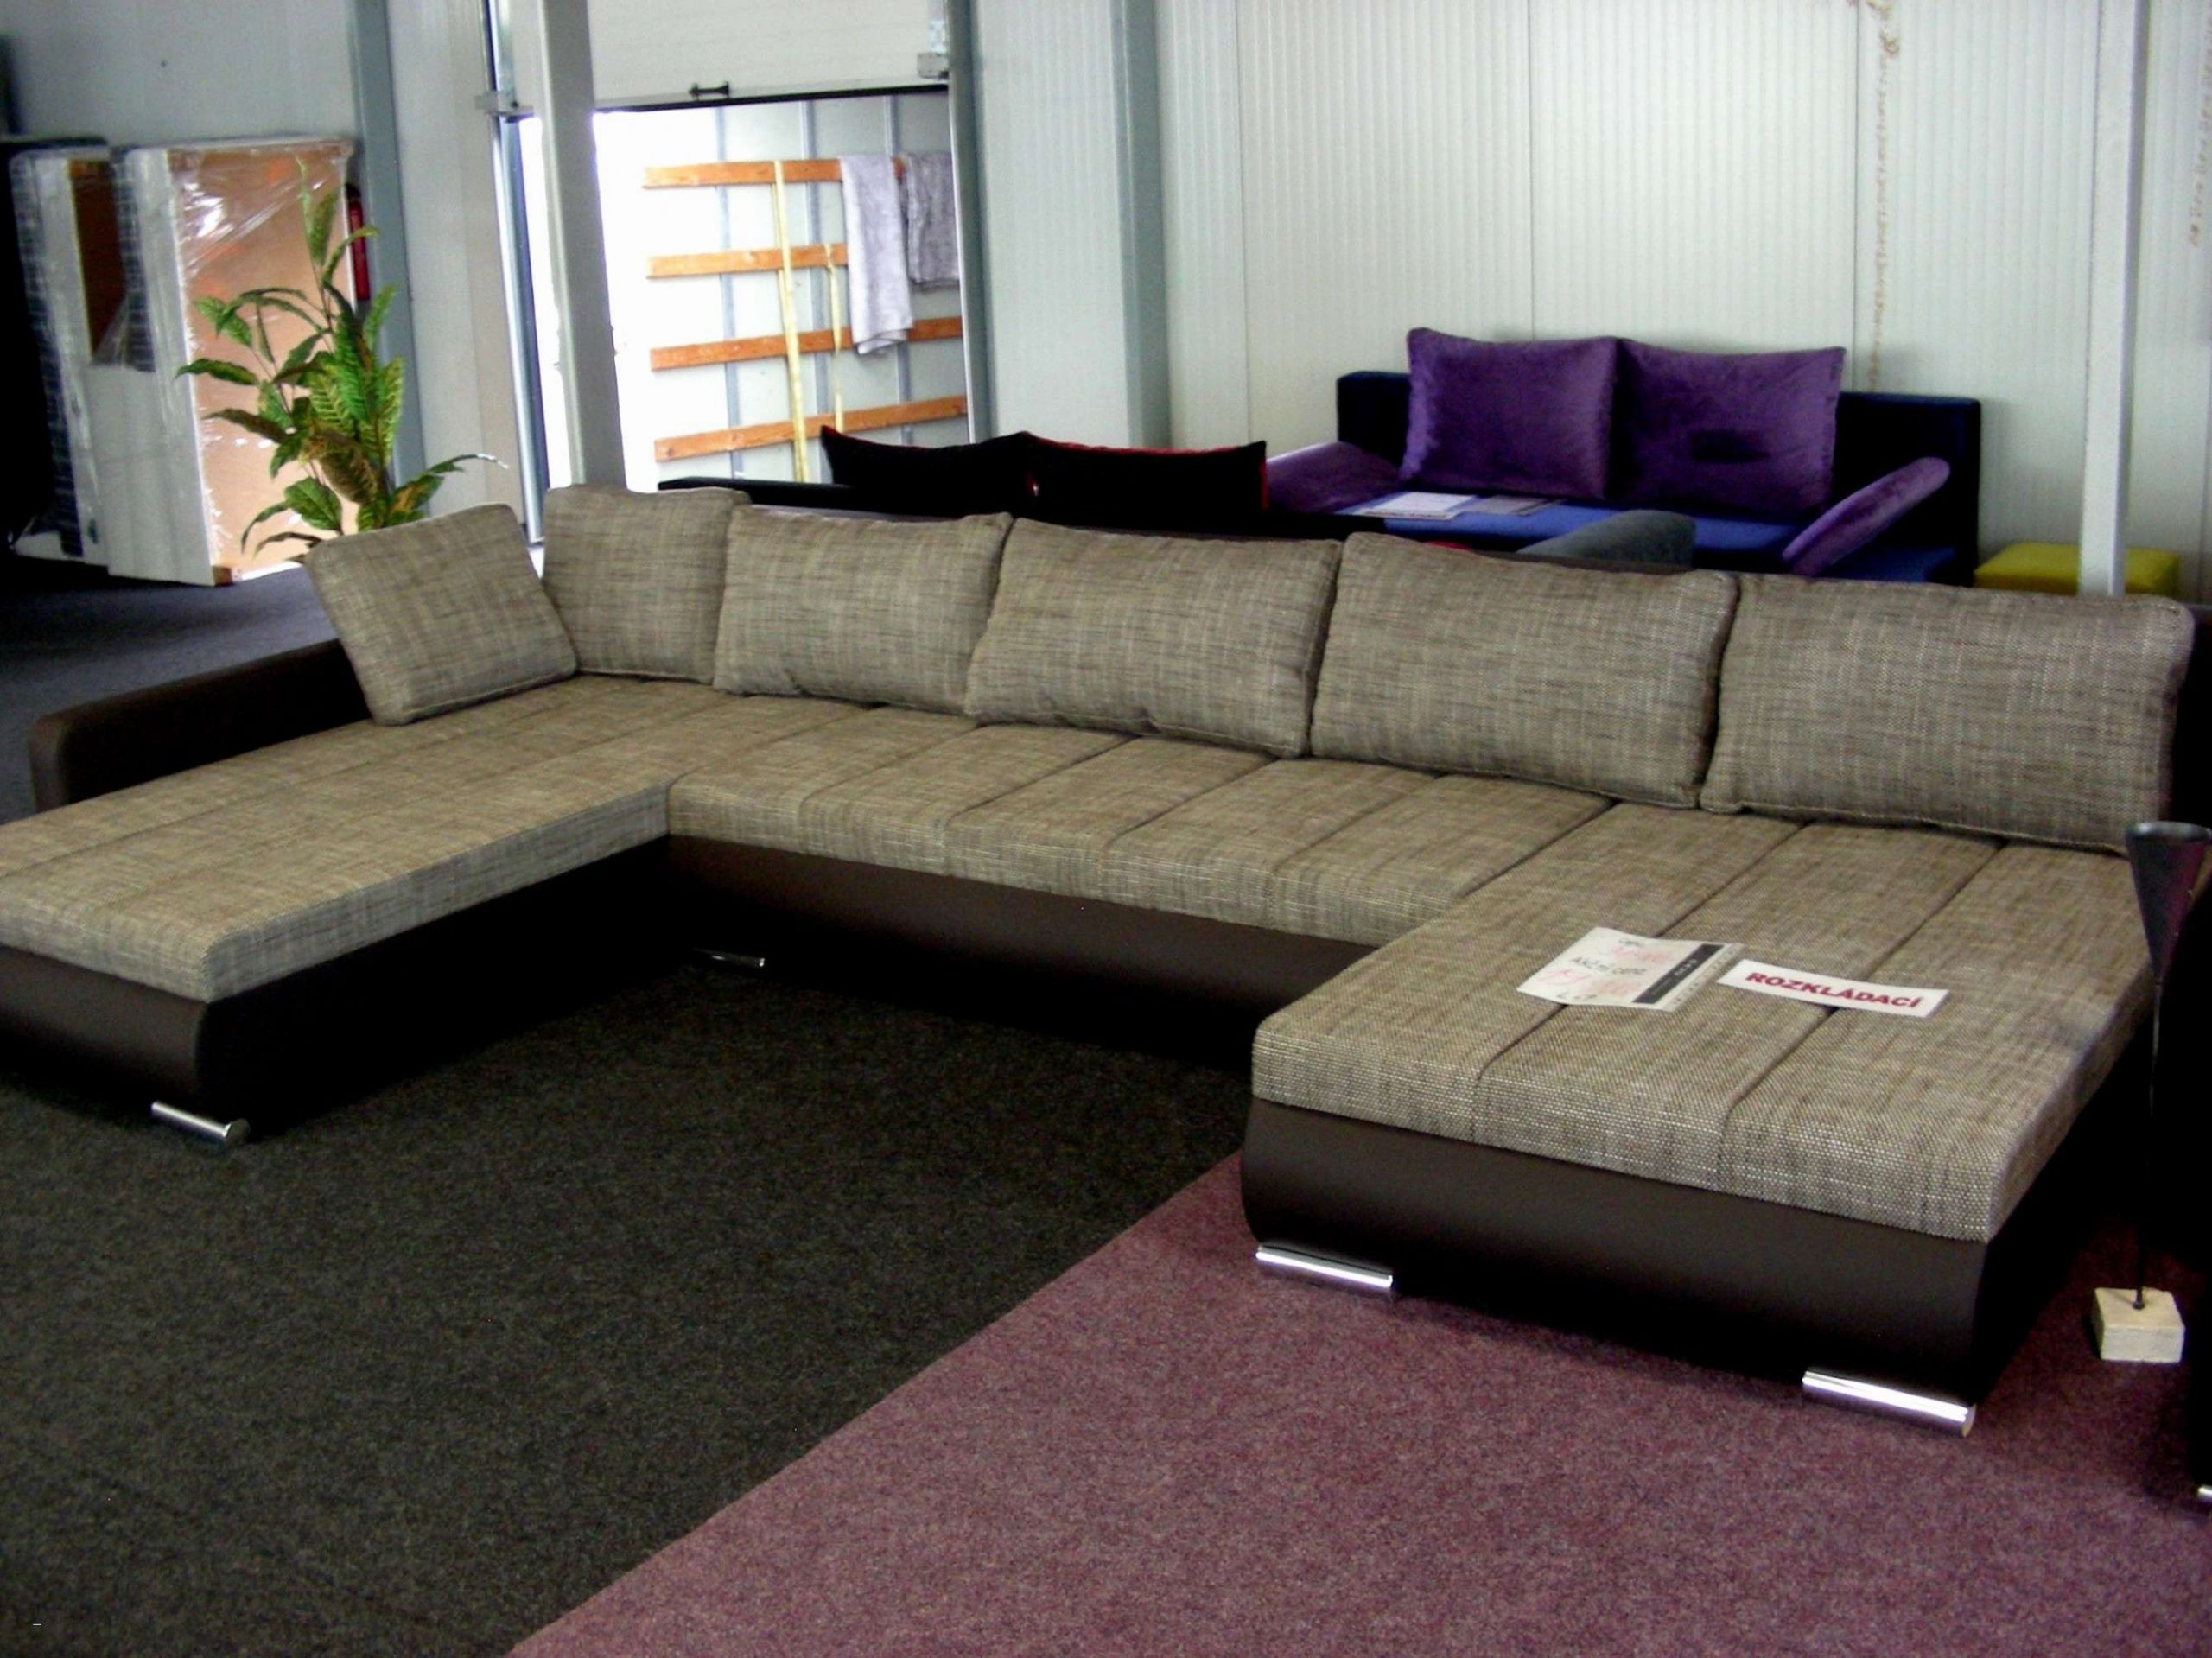 rooms outdoors elegant flur design ideen frisch sofa outdoor 0d